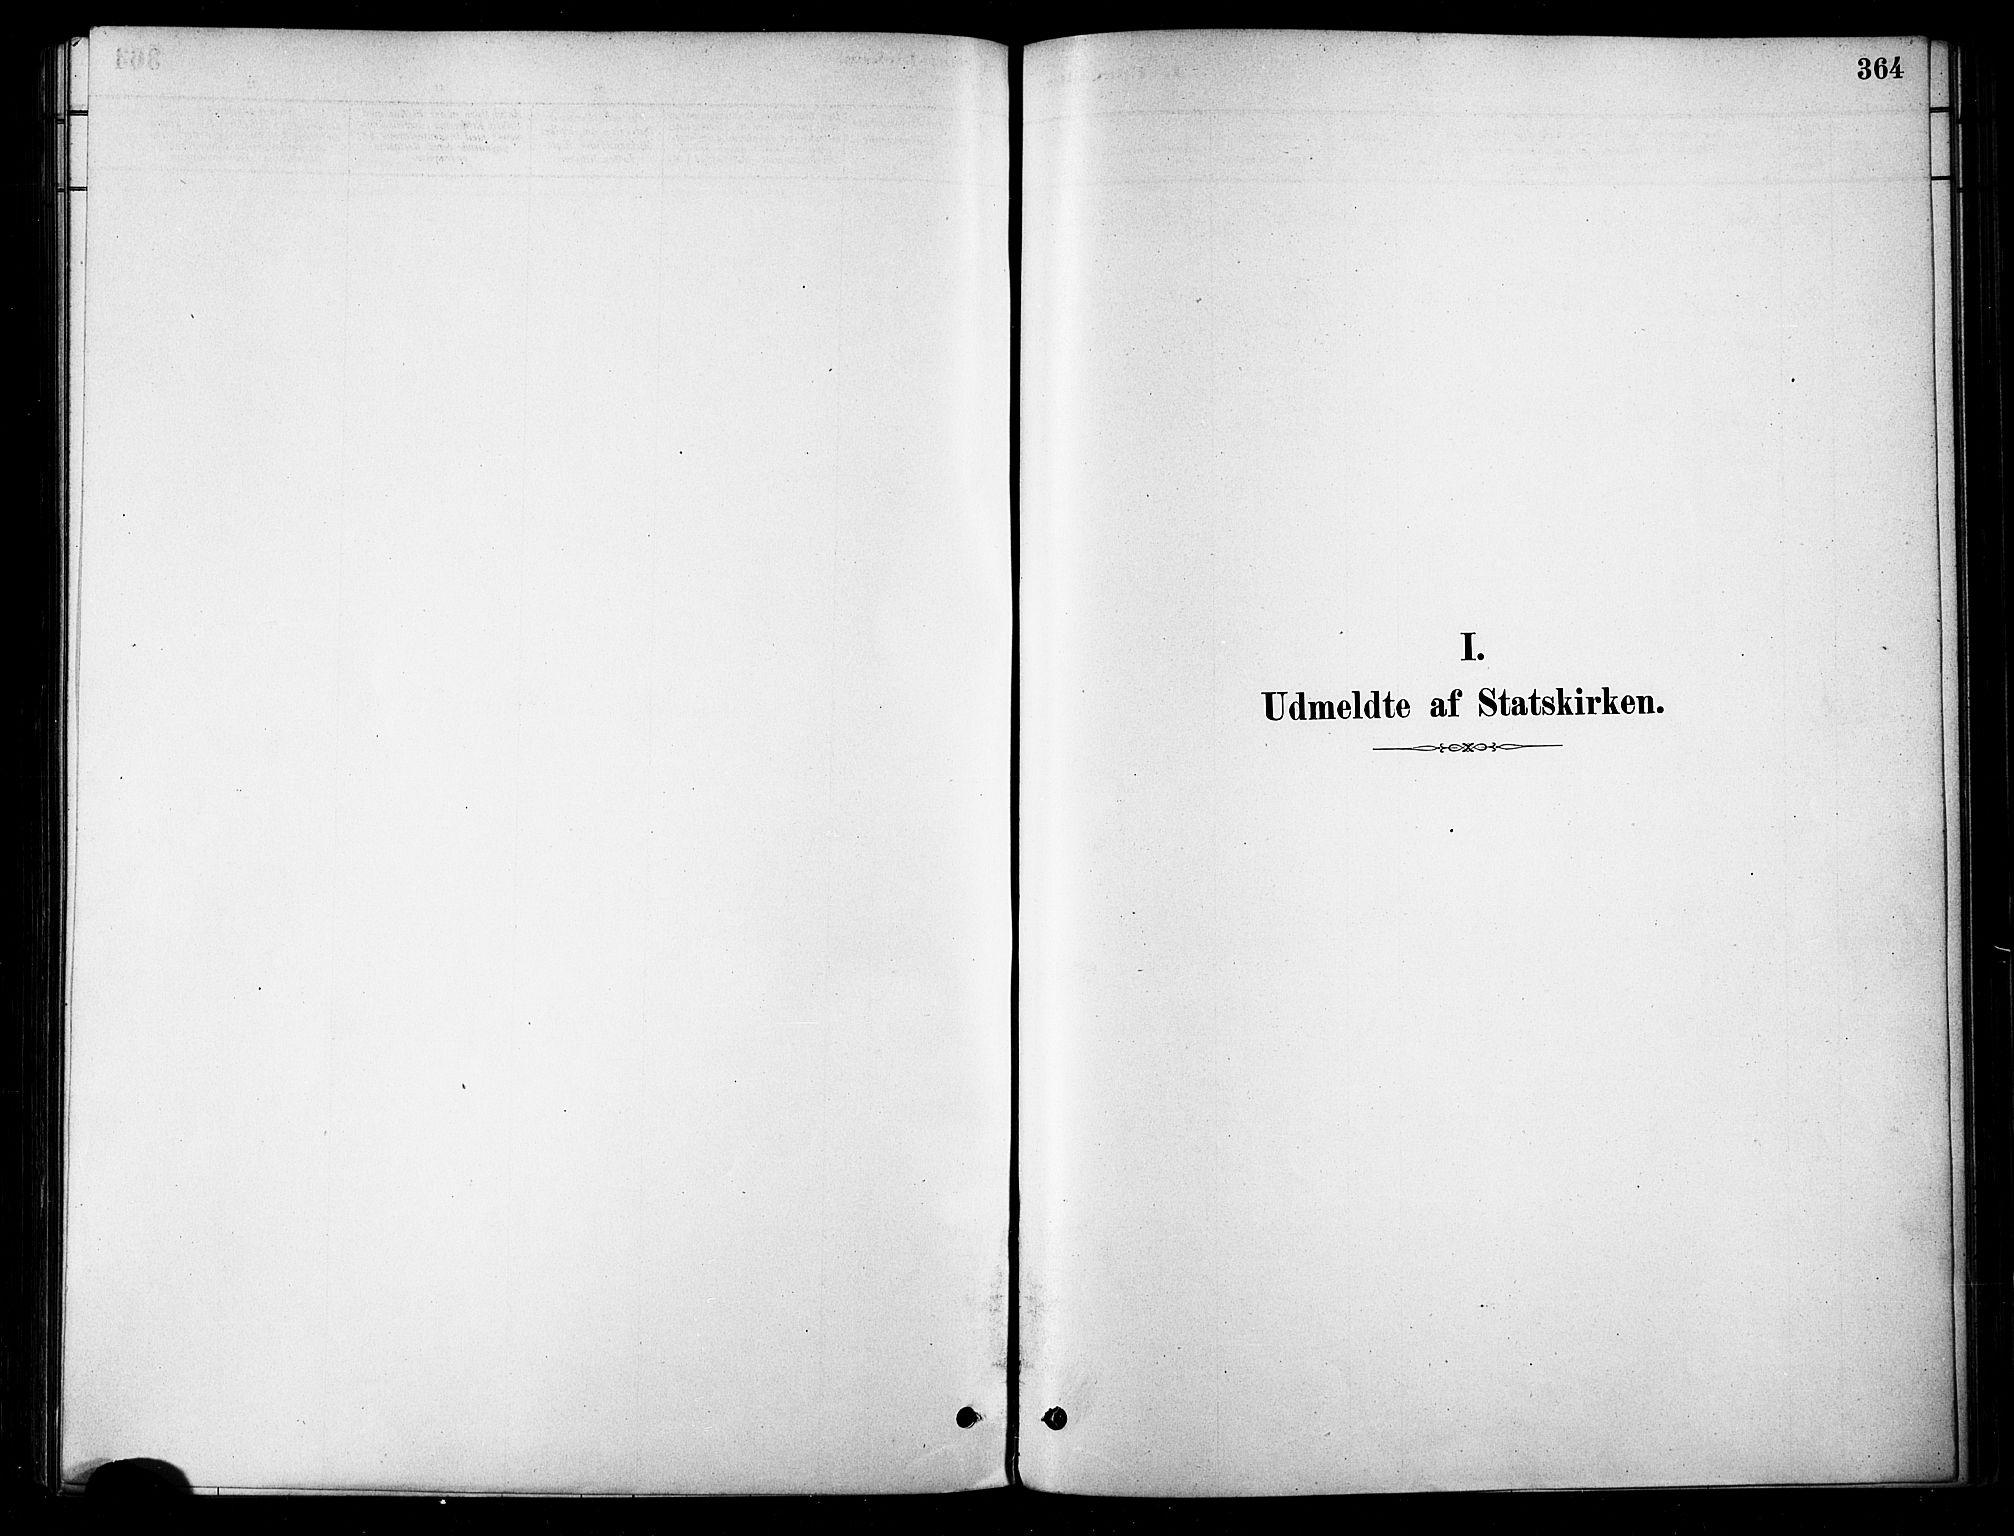 SATØ, Karlsøy sokneprestembete, H/Ha/Haa/L0006kirke: Parish register (official) no. 6, 1879-1890, p. 364